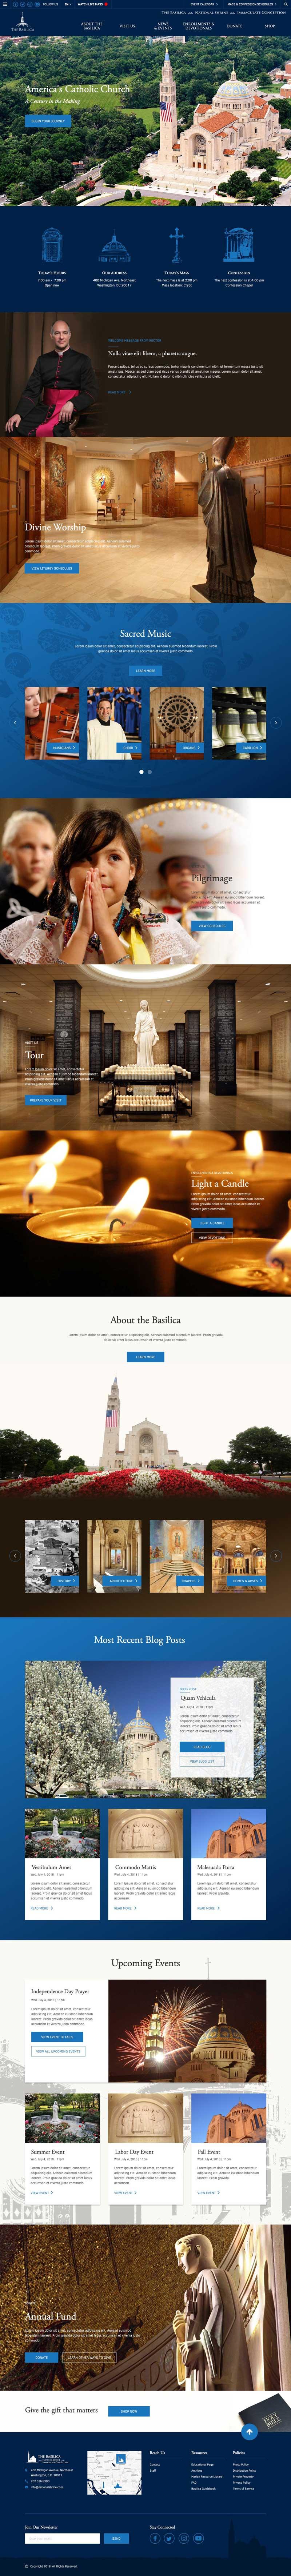 Basilica's Home Page Mockup